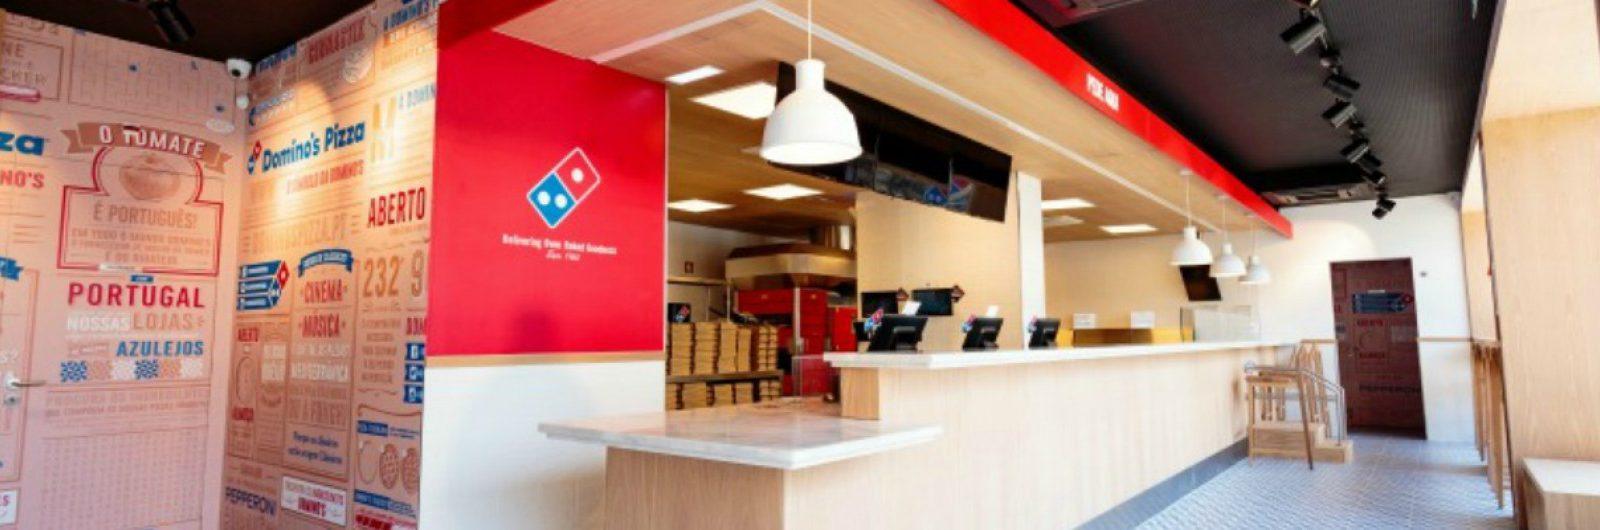 domino's pizza abre a primeira loja em Portugal